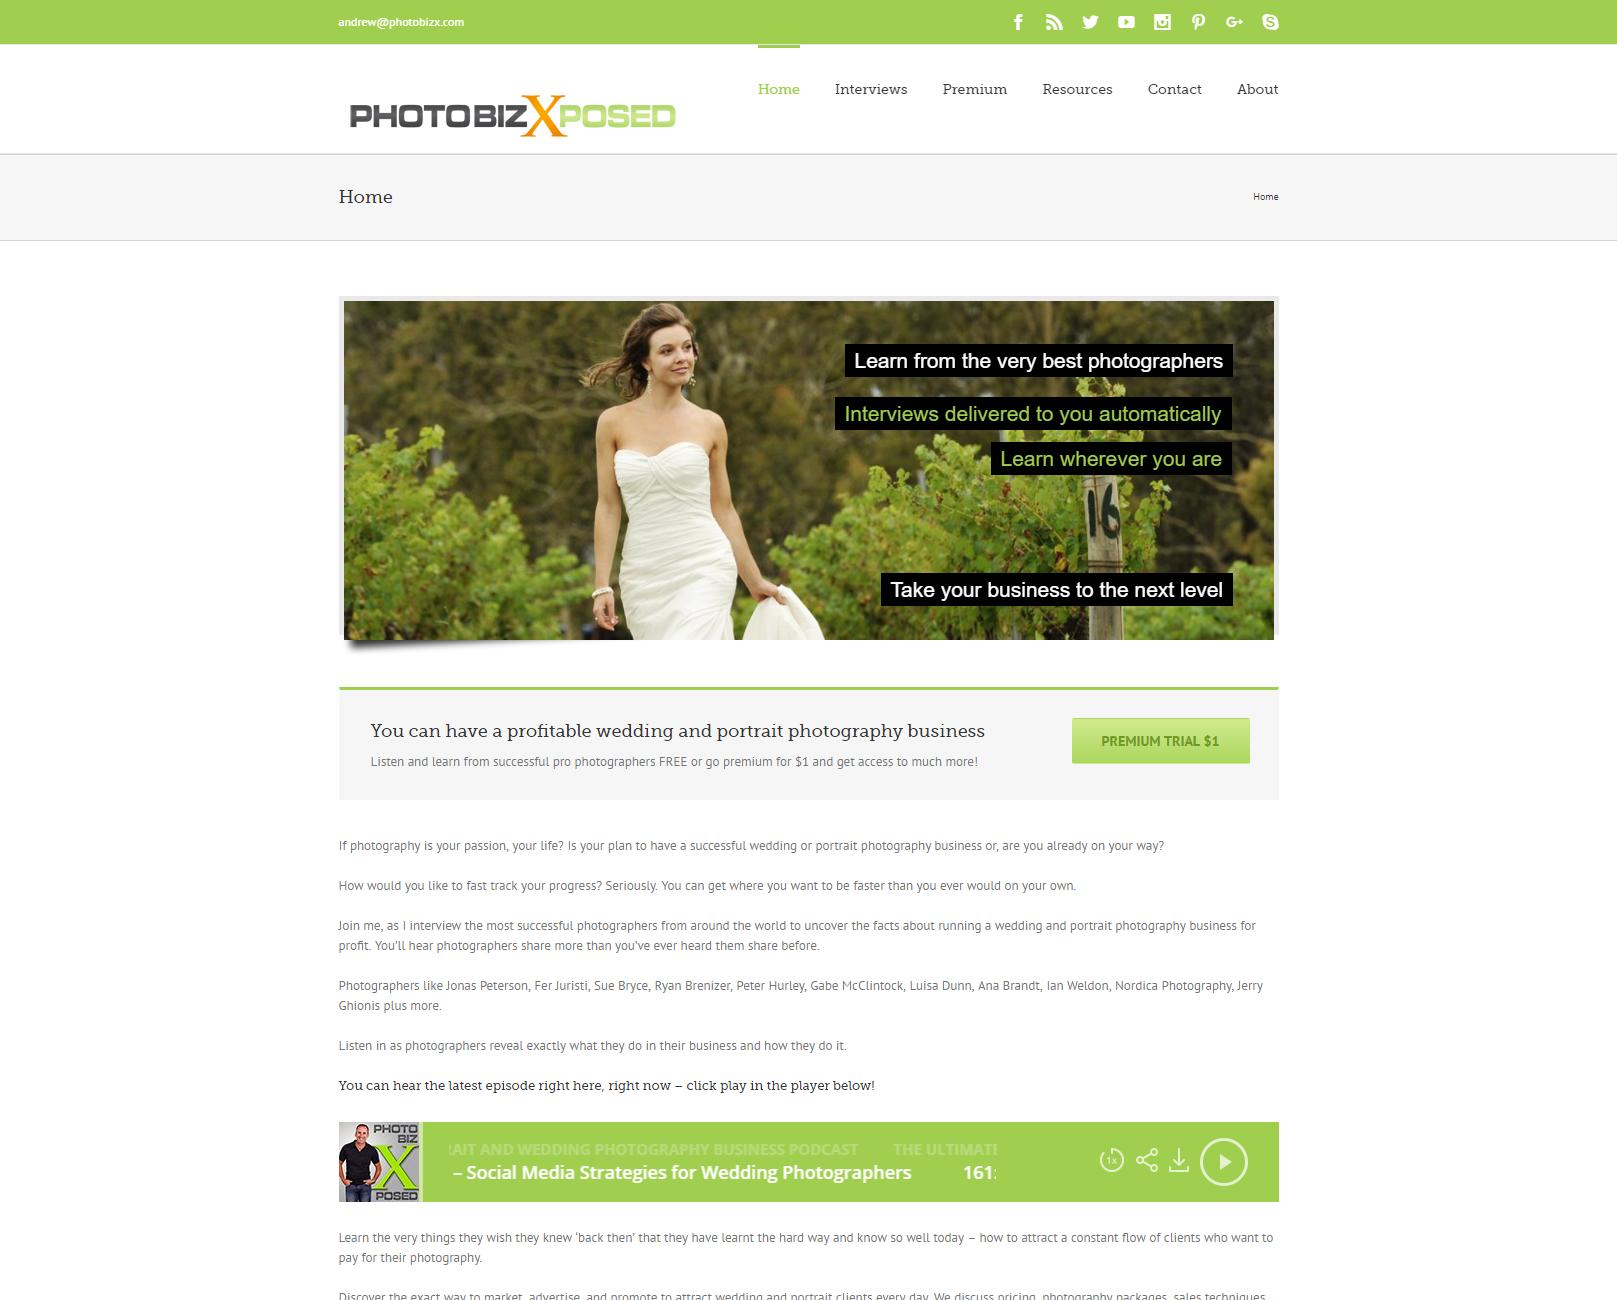 homepage-01-before